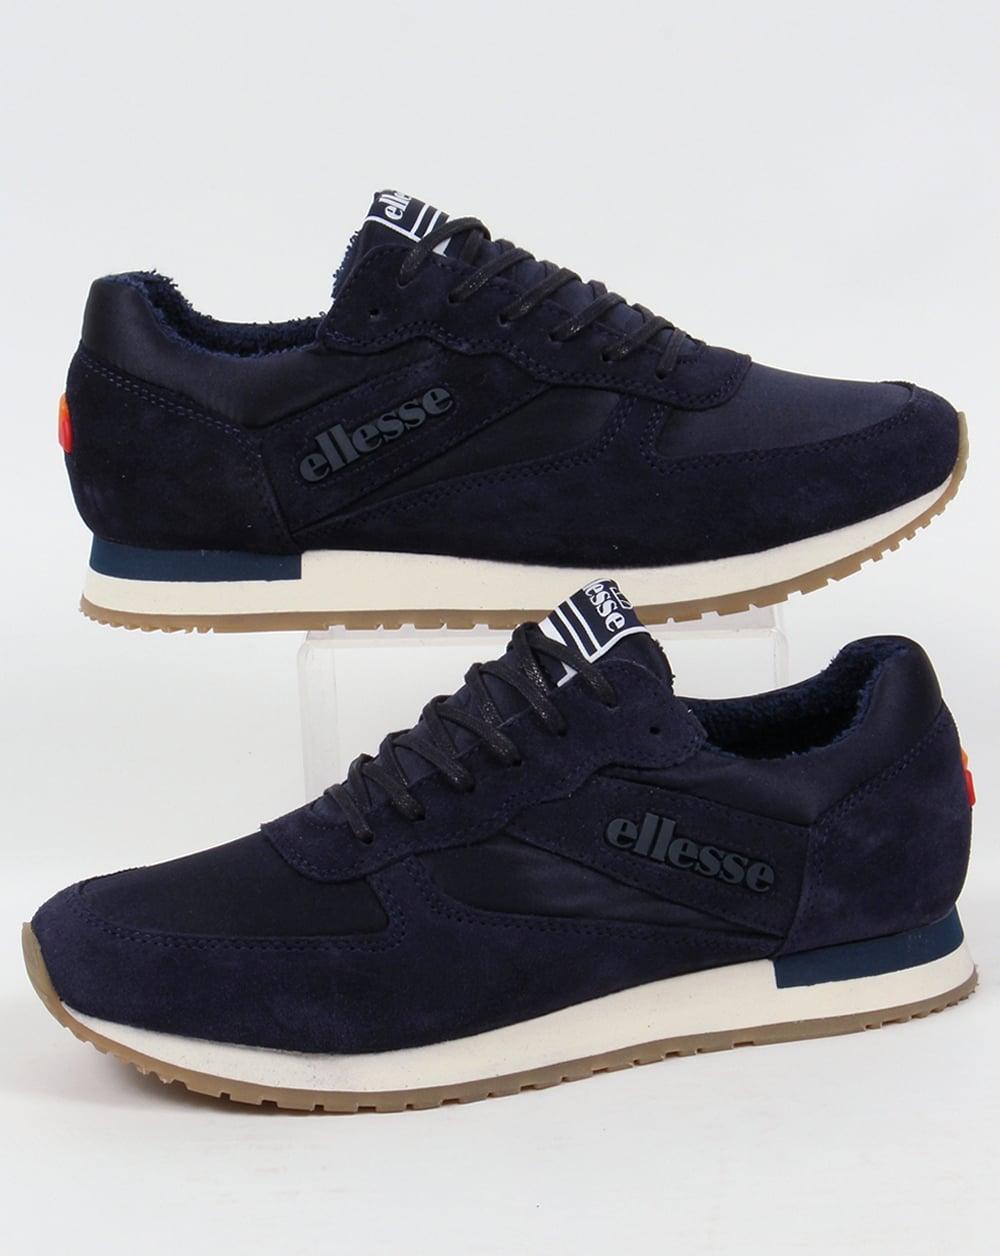 990b0f4ea Ellesse LS747 Runner Trainers Navy,suede,premium,shoes